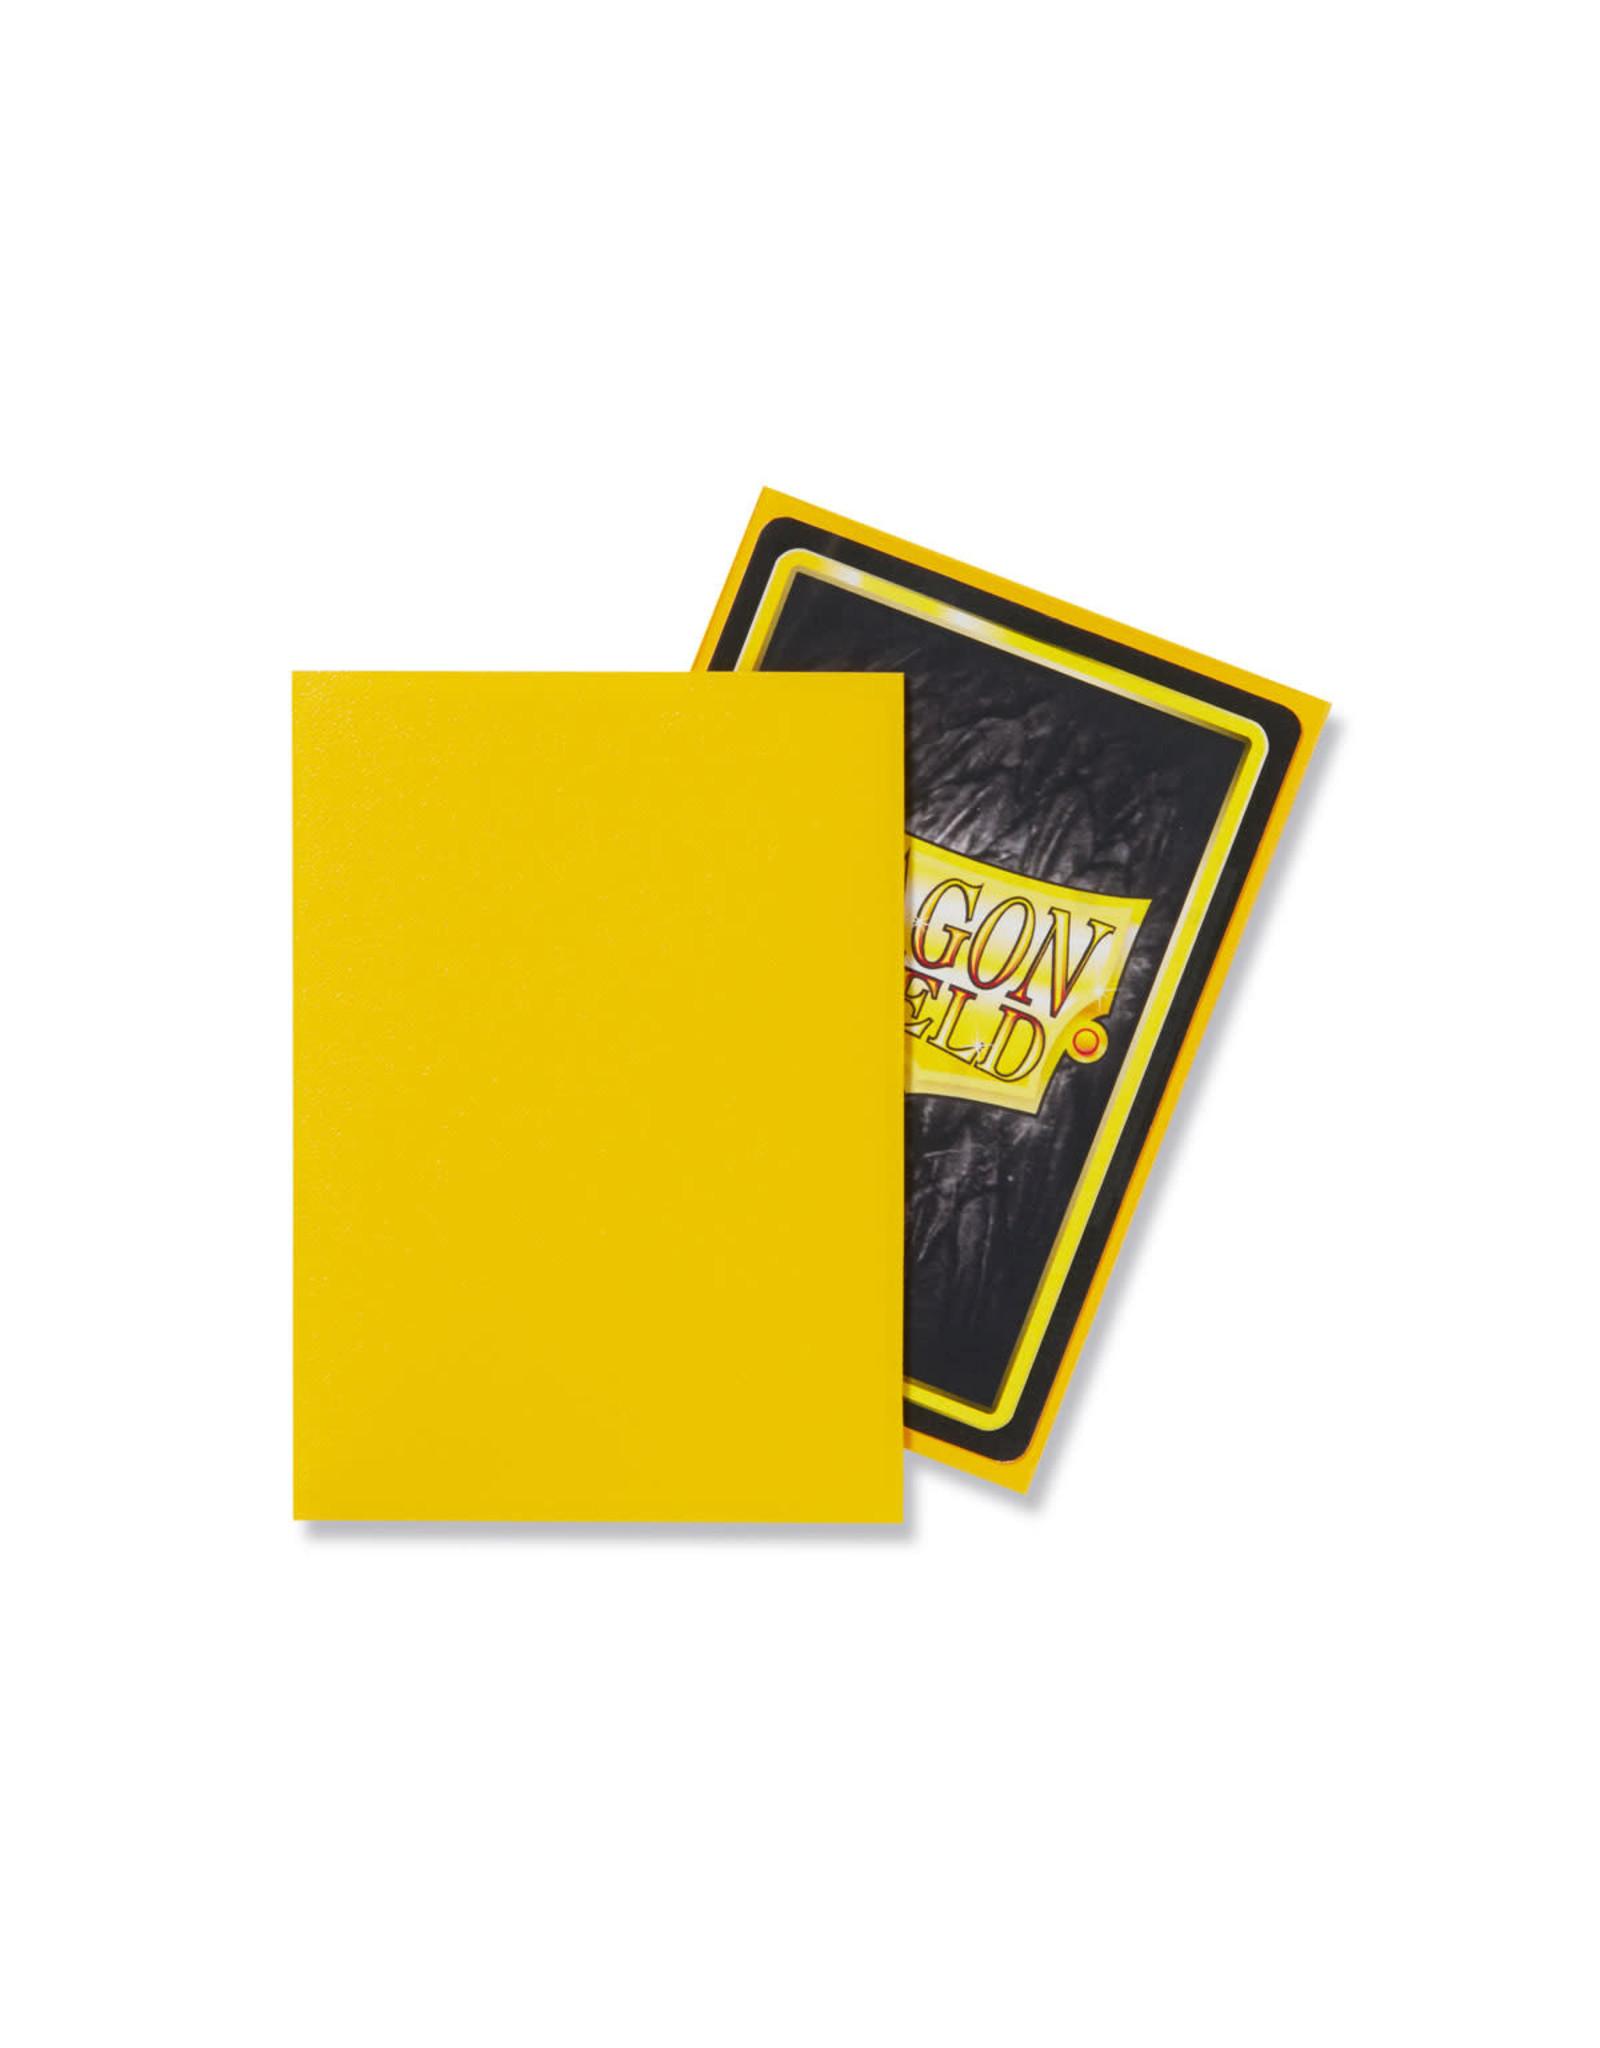 DRAGON SHIELD SLEEVES: MATTE Yellow (BOX OF 100)